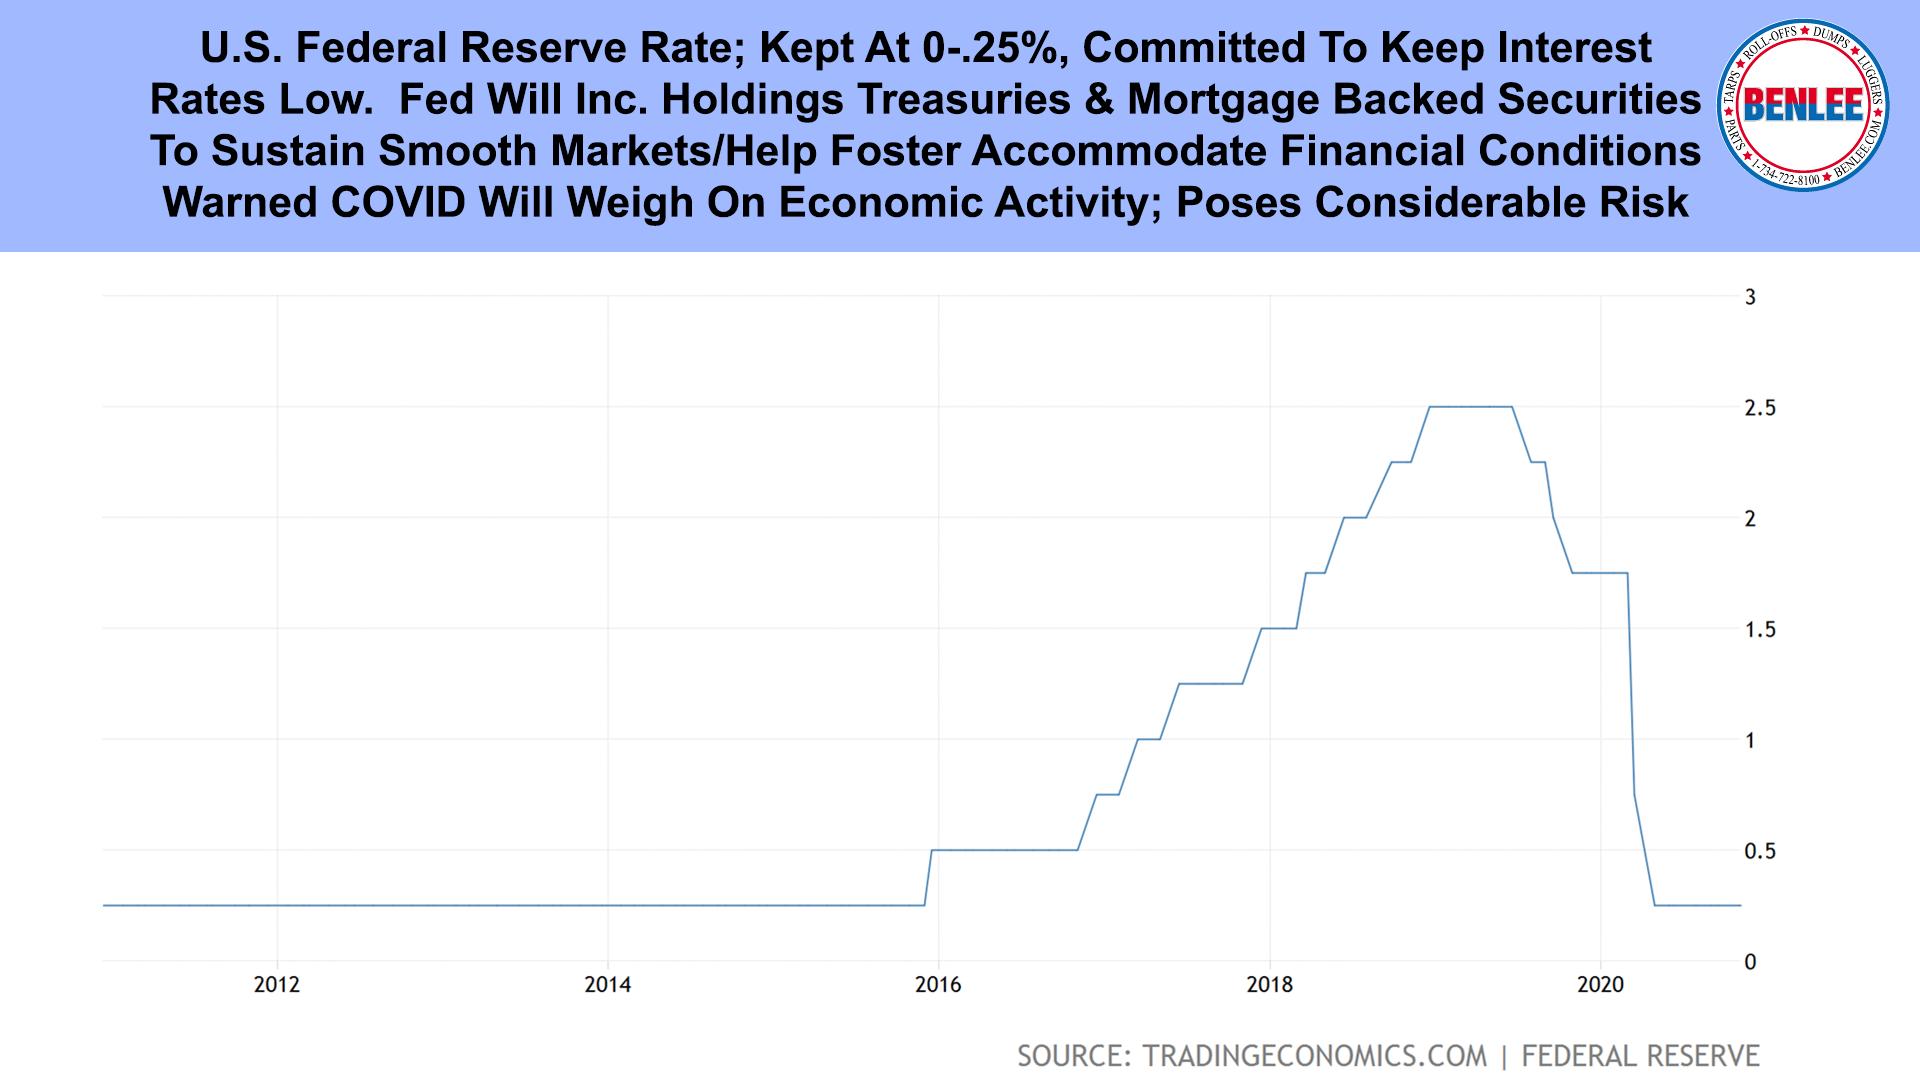 U.S. Federal Reserve Rate